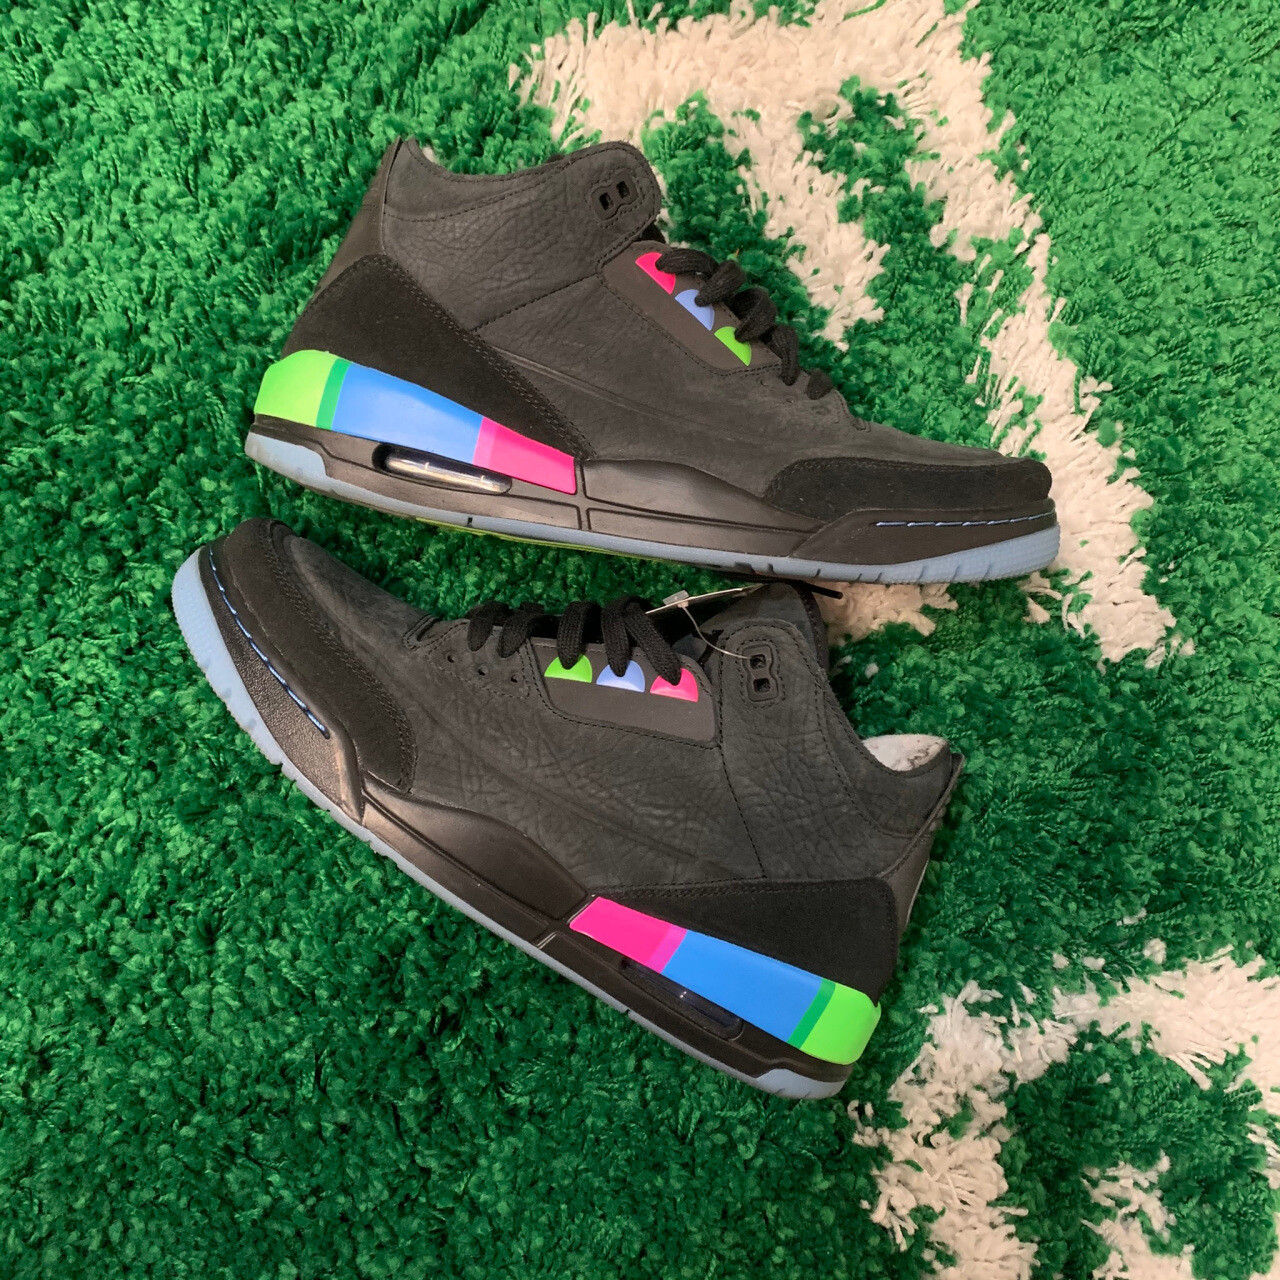 Nike Air Jordan 3 Quai Black Size 10.5